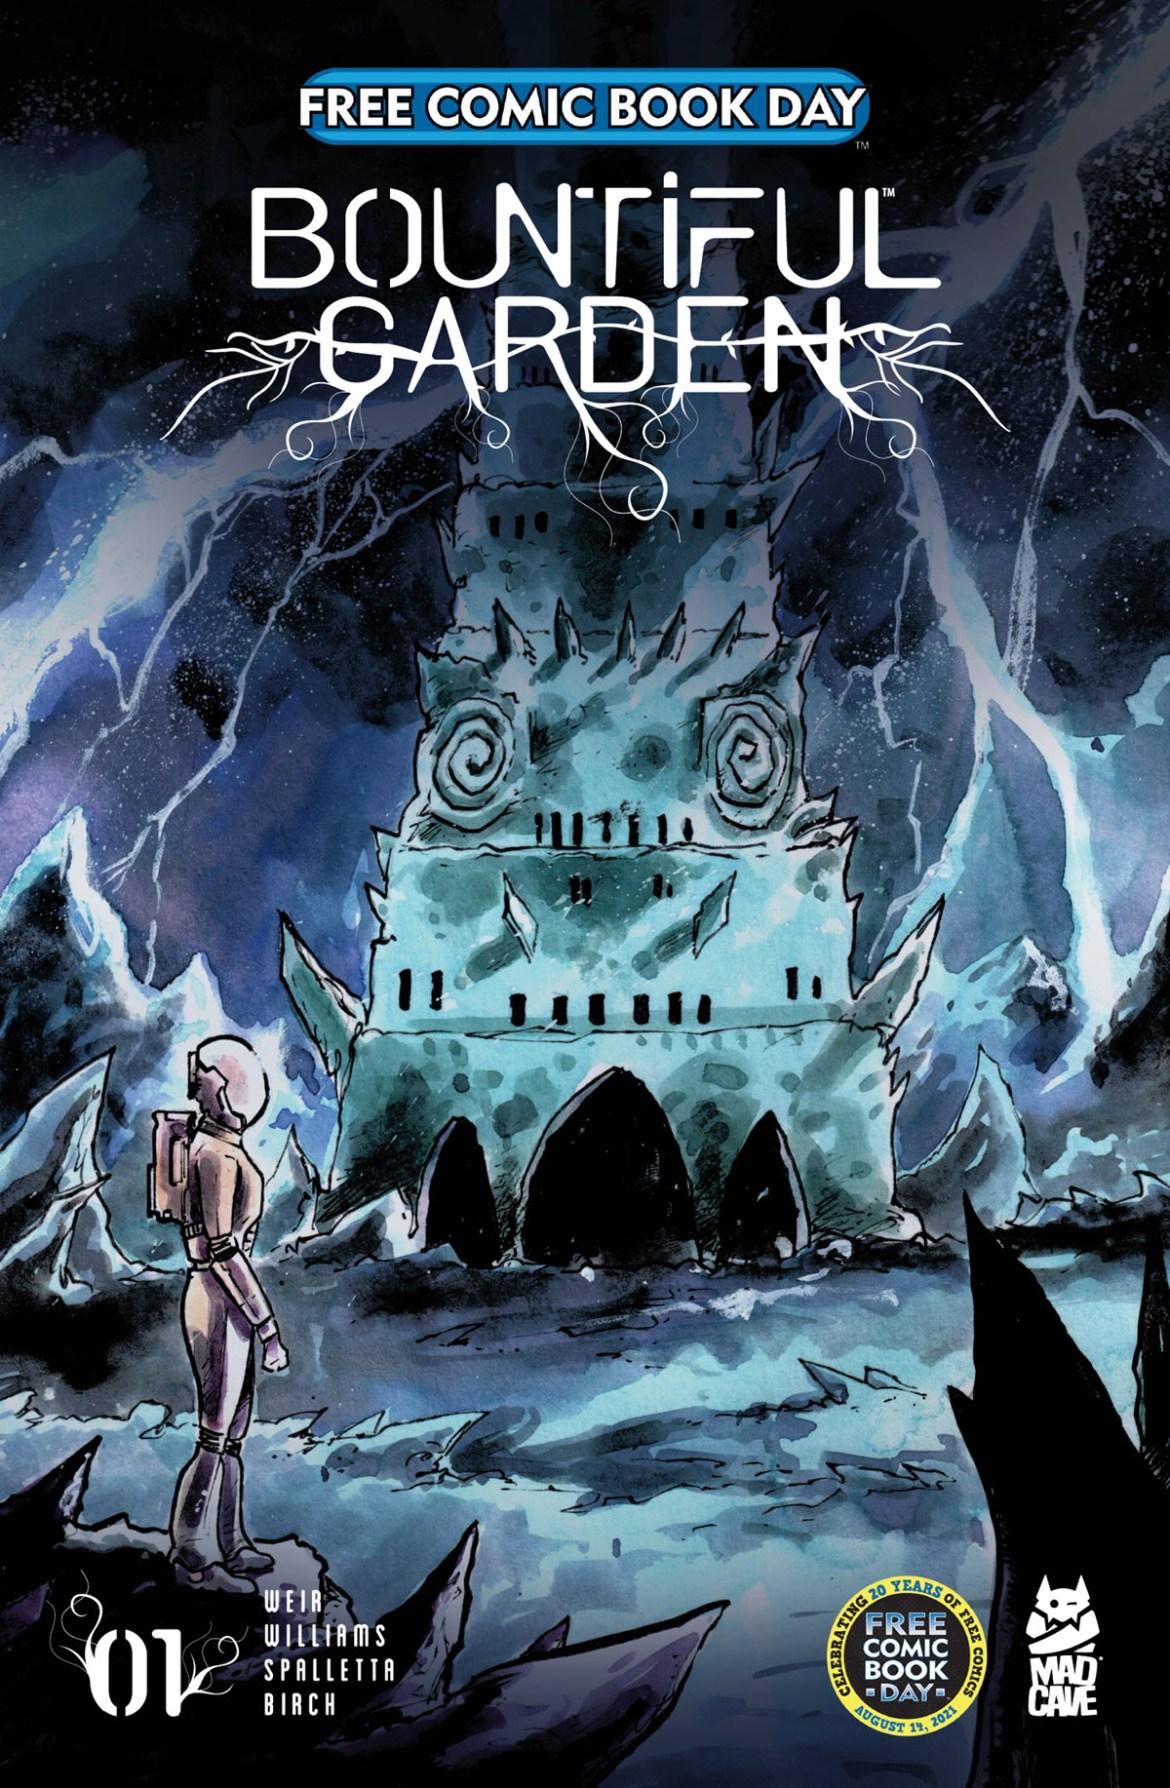 FCBD21_SILVER_Mad-Cave_Bountiful-Garden-1 Complete Free Comic Book Day 2021 comic book line-up announced